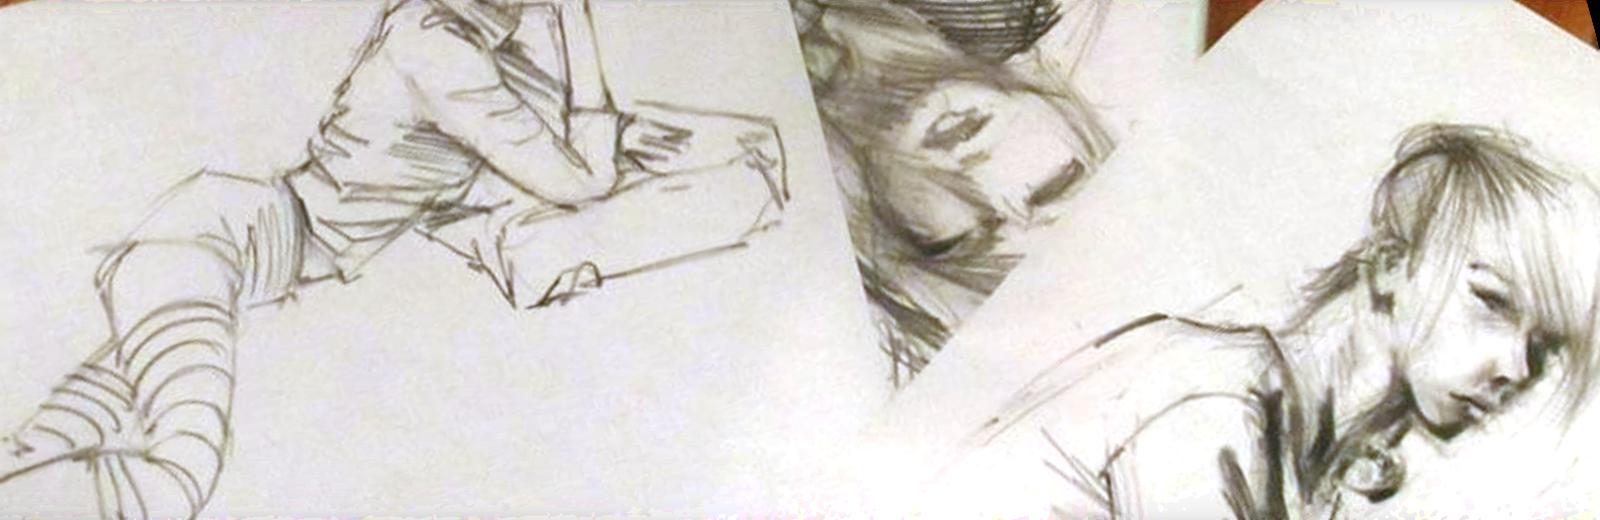 slider-sketches-1600×540